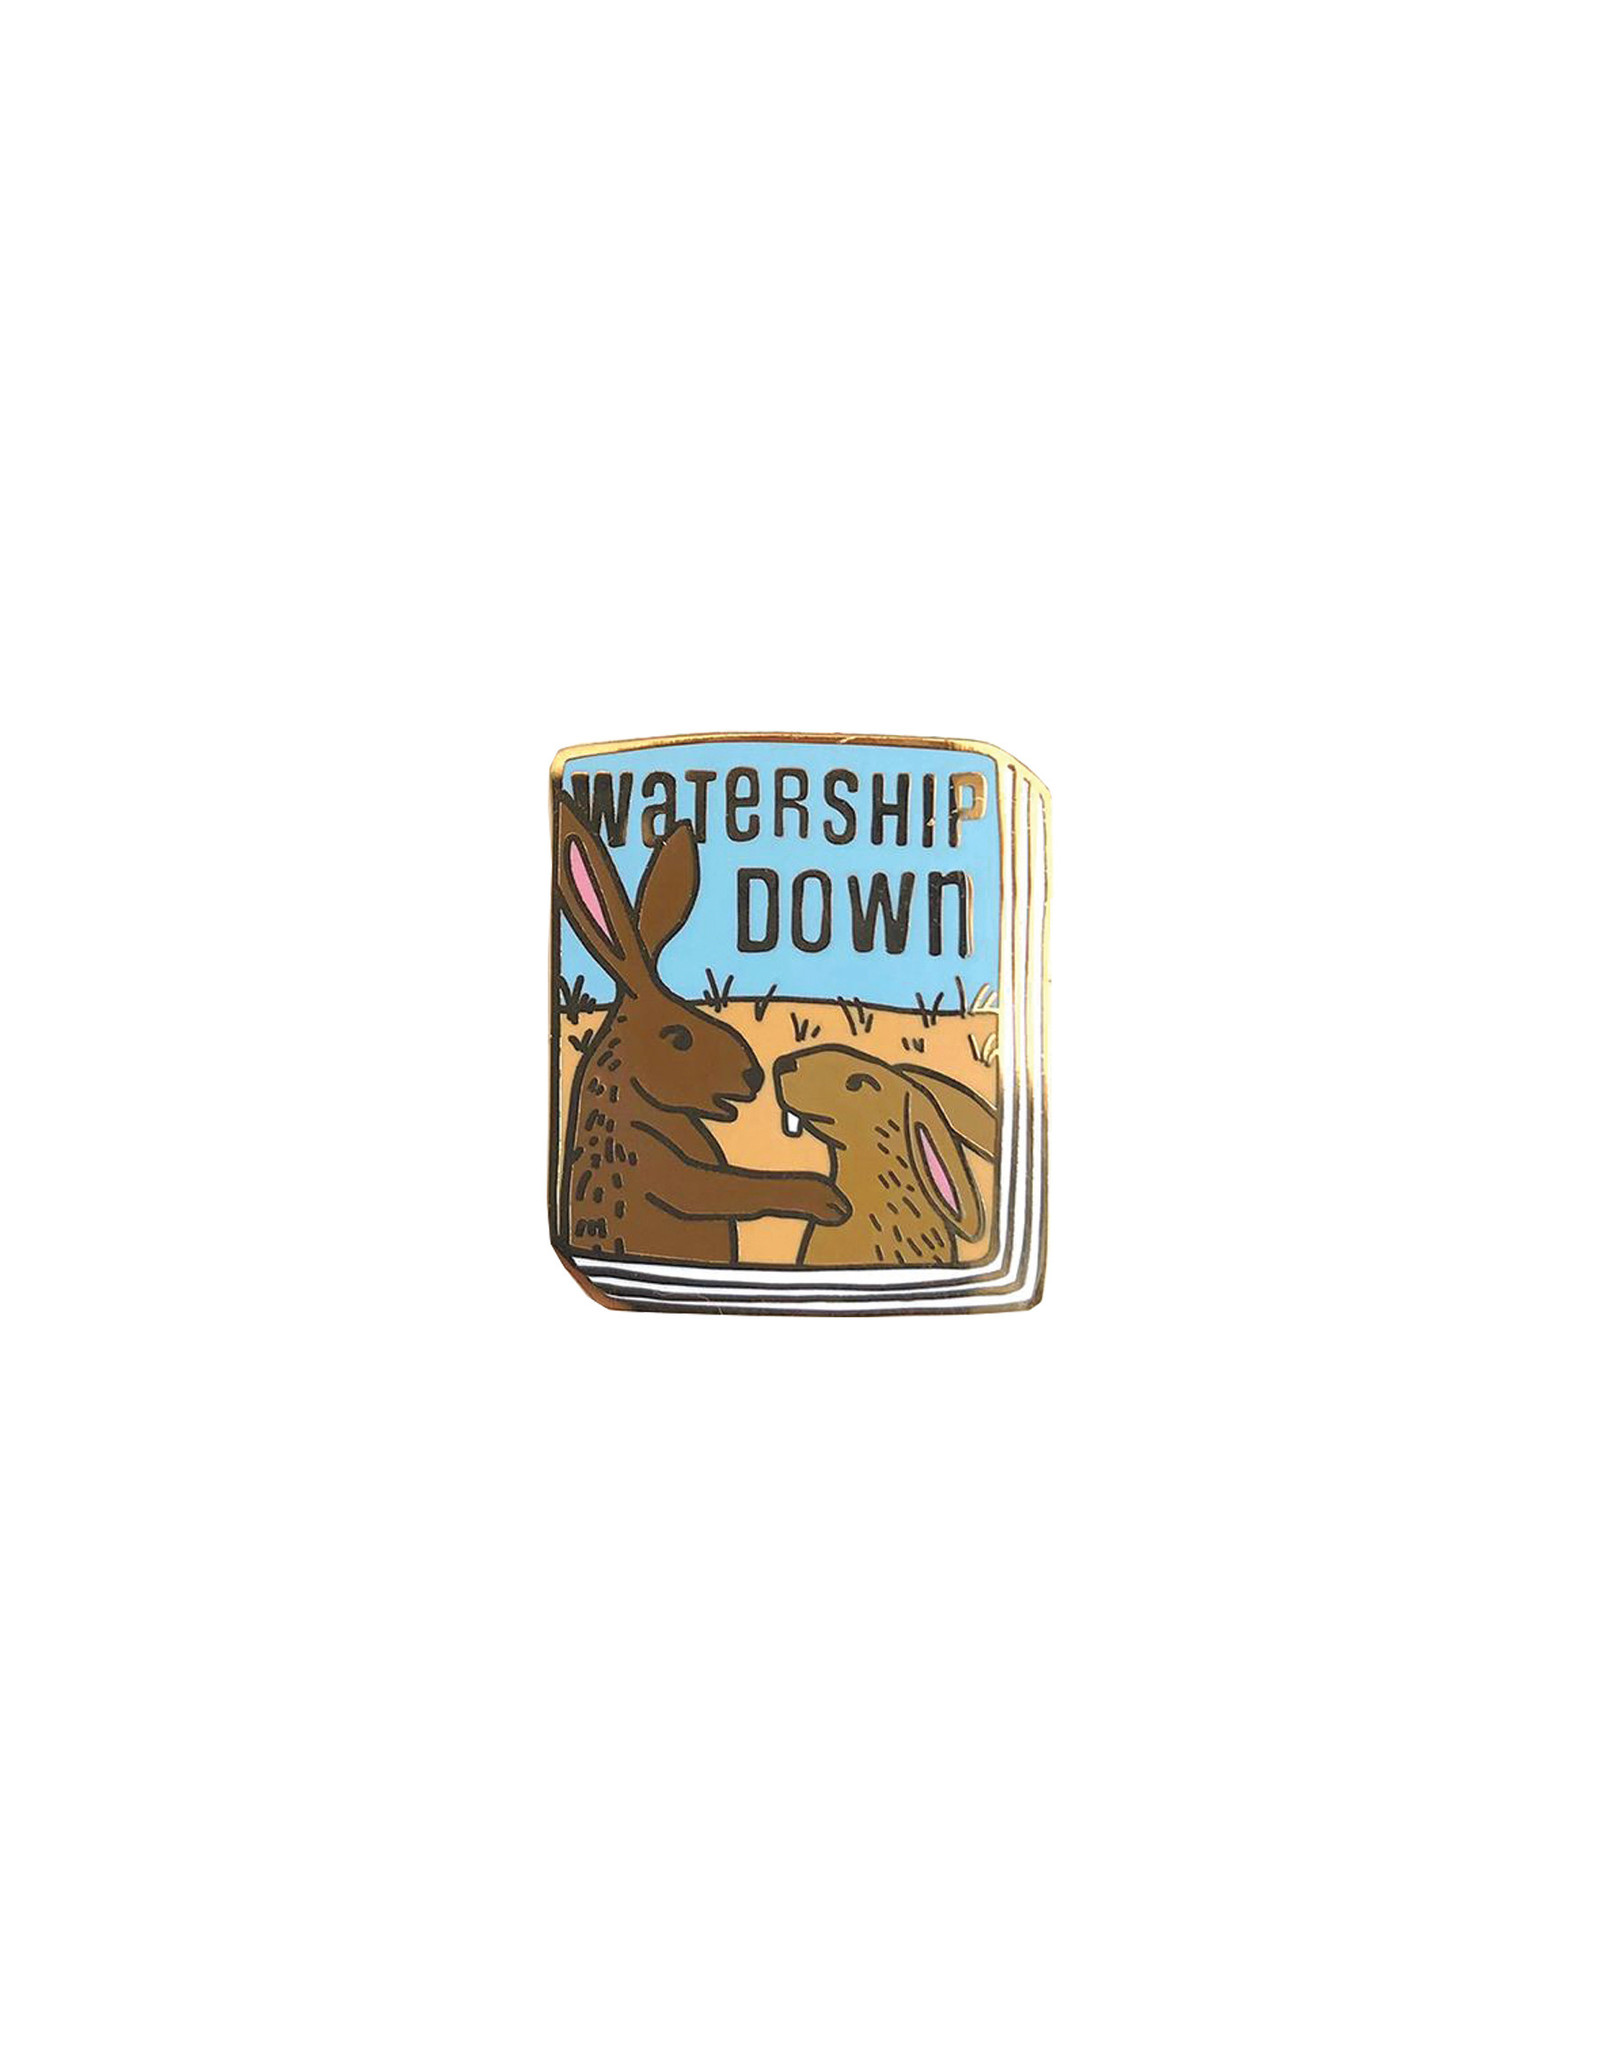 Ideal Bookshelf Book Pin: Watership Down